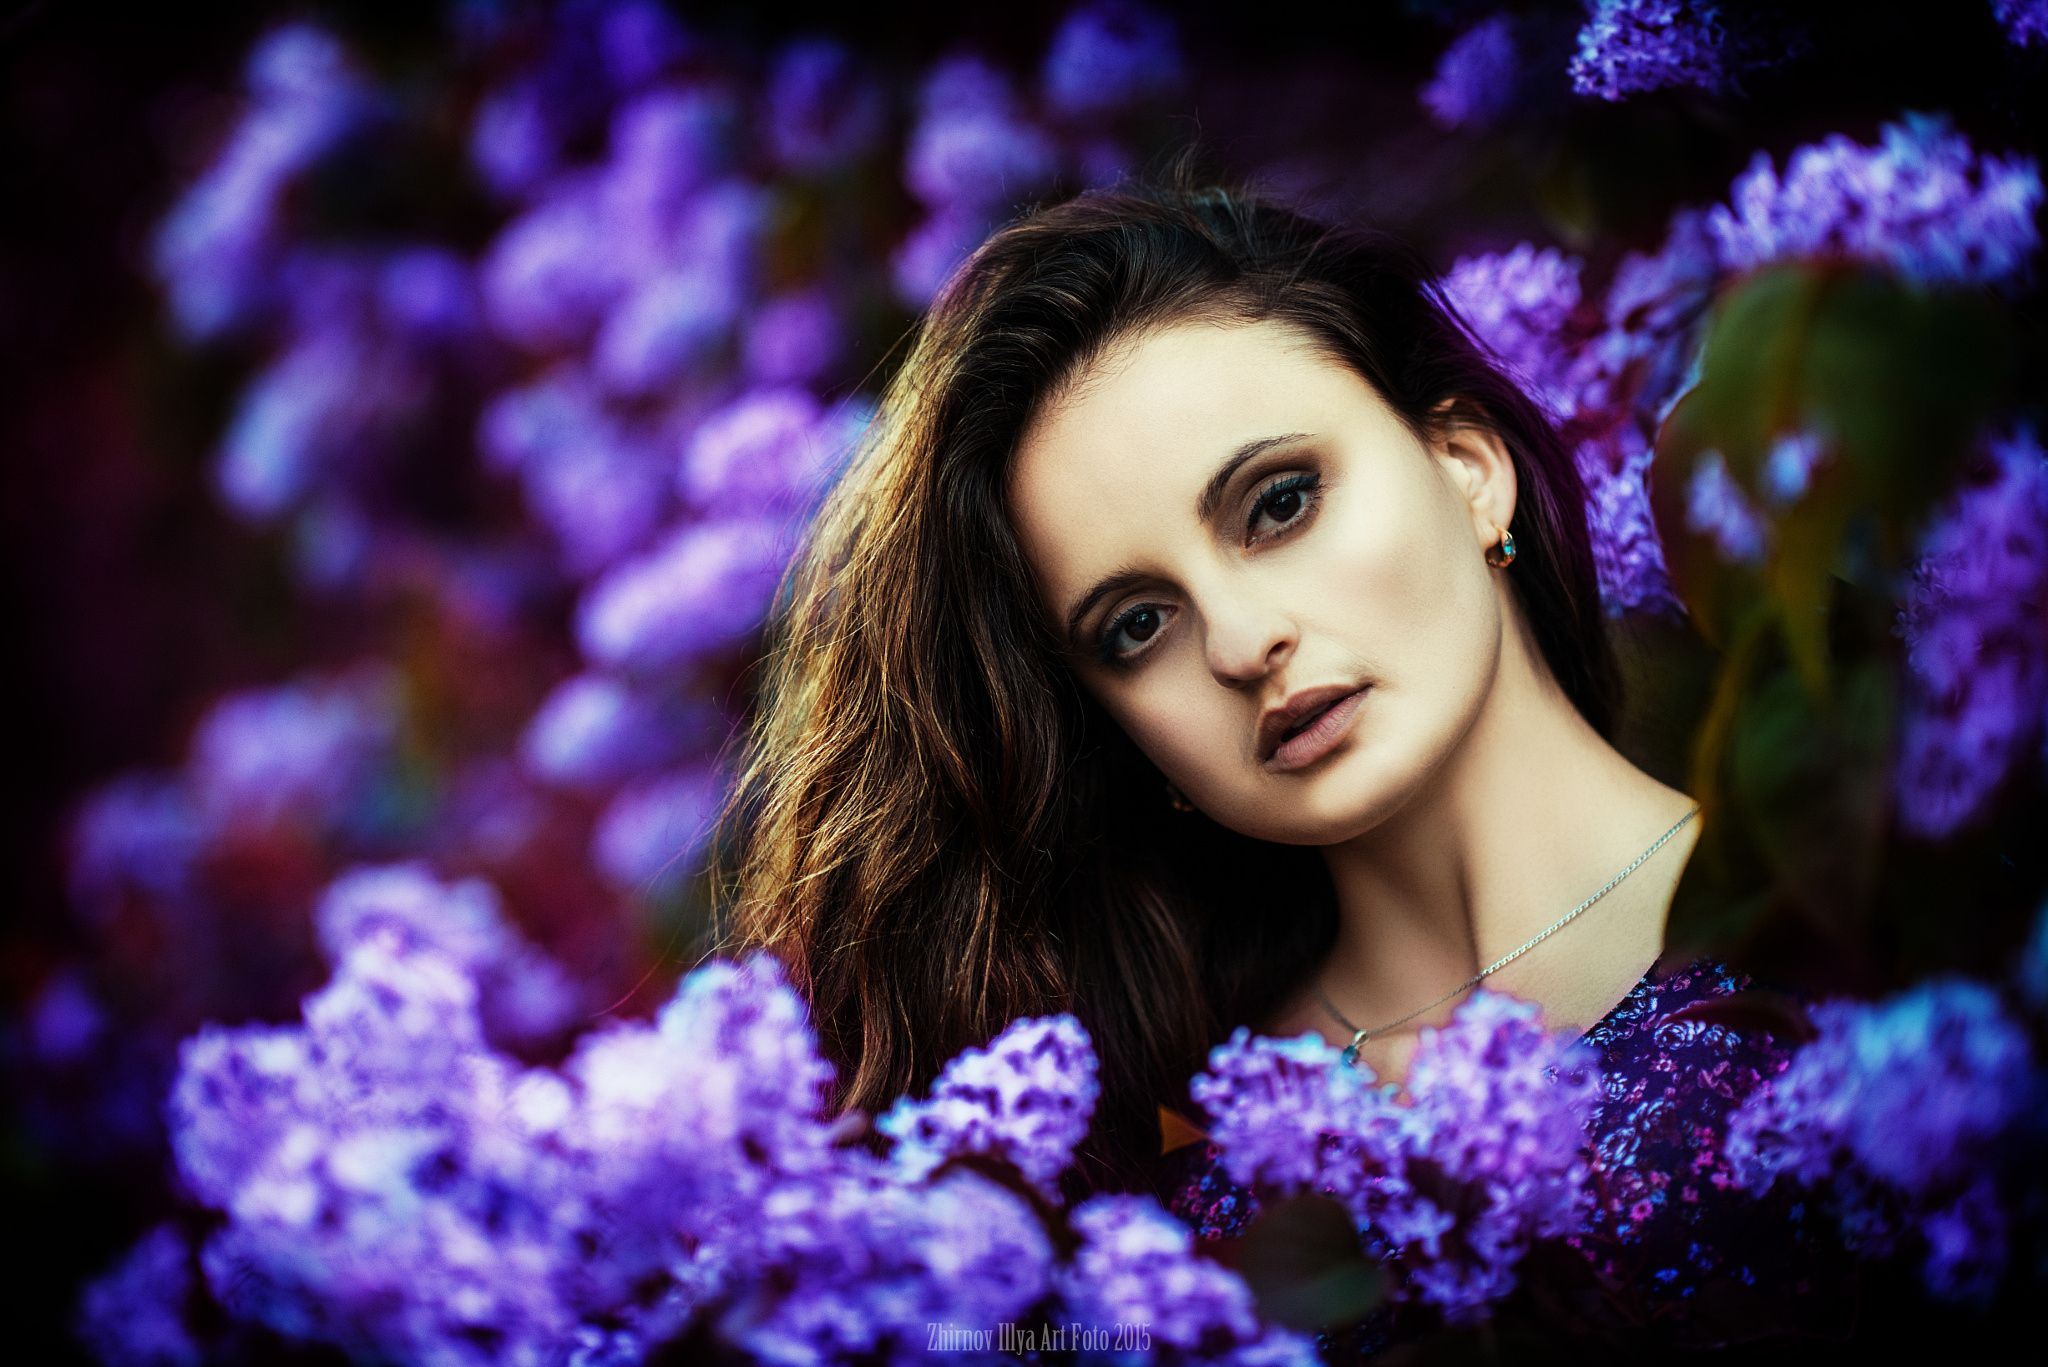 Anastasia blue by Илья  Жирнов on 500px